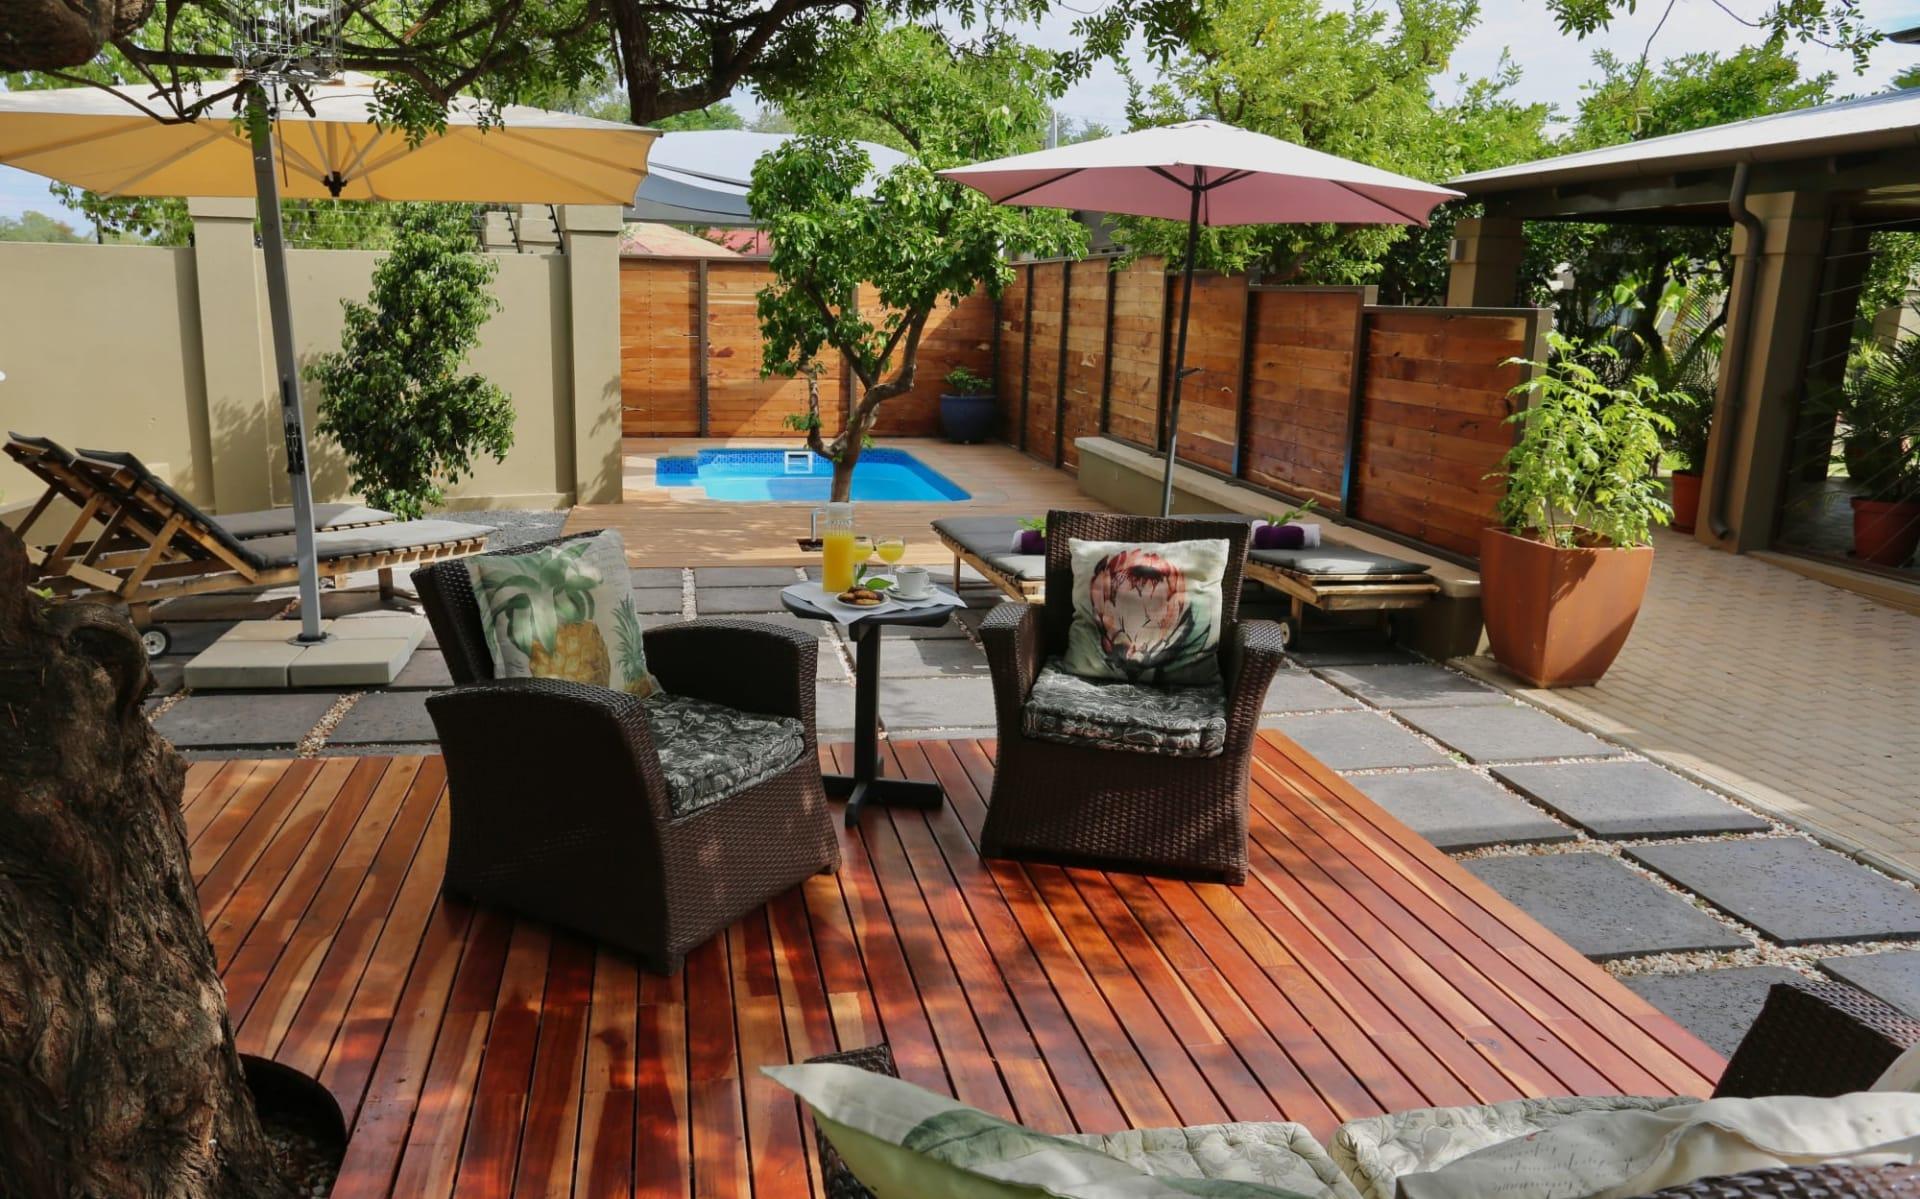 Villa Violet in Windhoek Stadt: exterior Villa Violet - Swimmingpool mit Loung